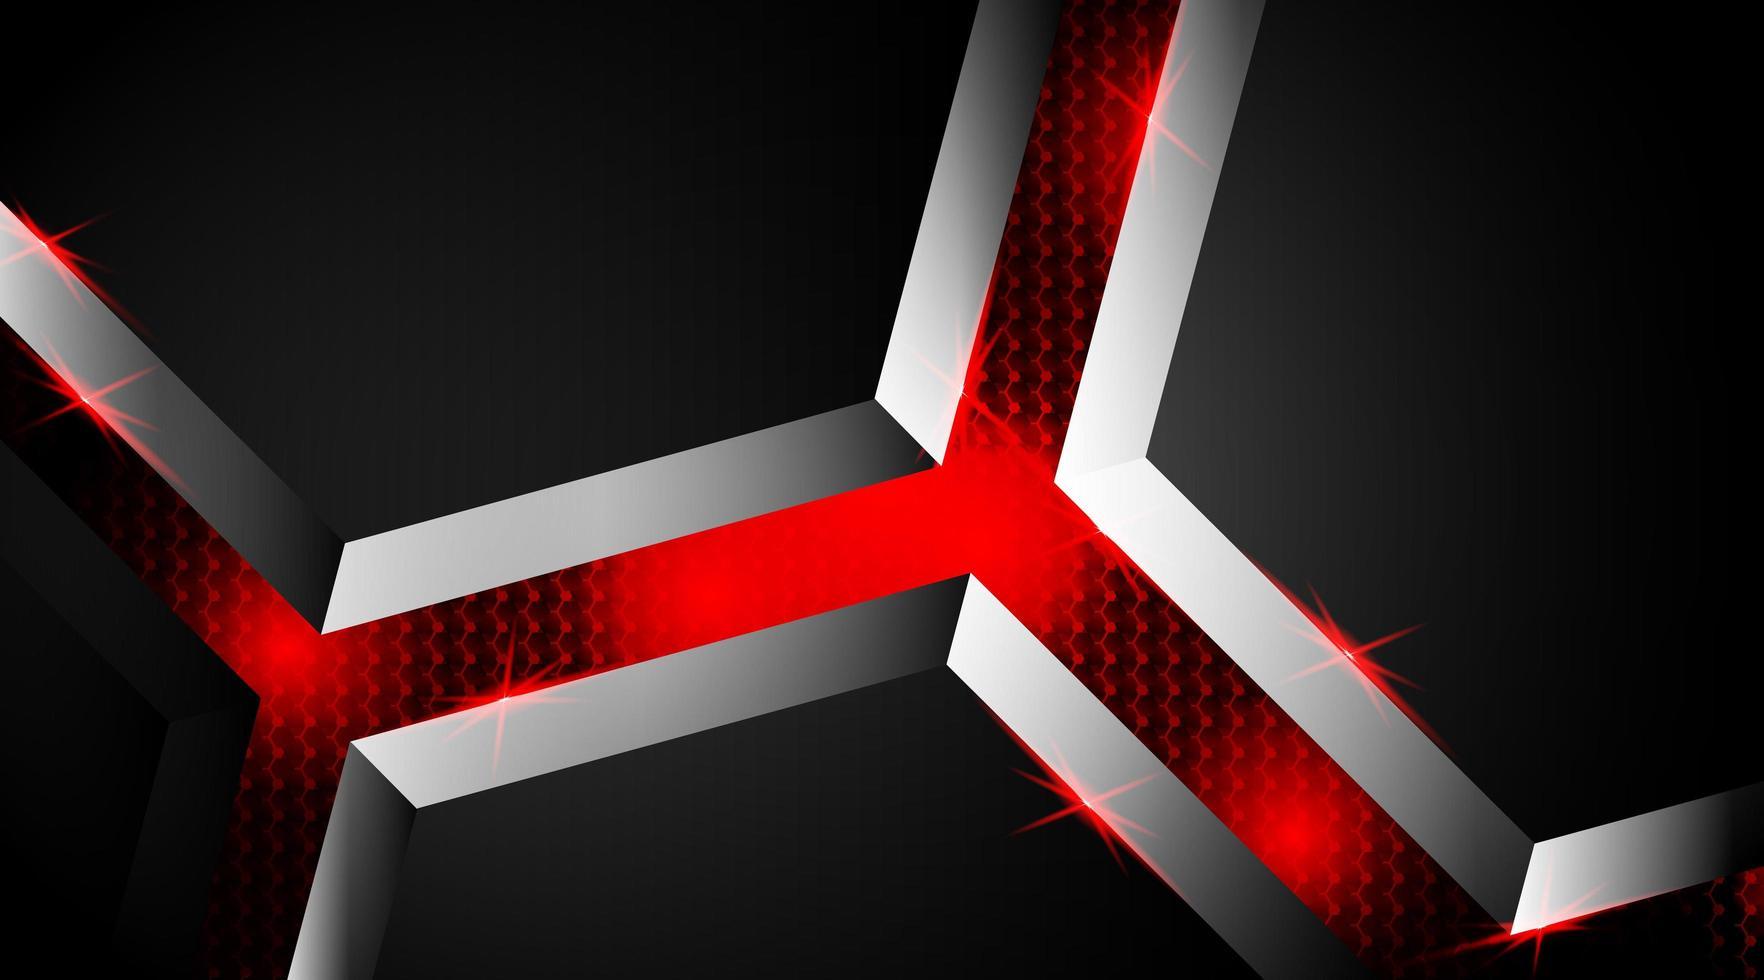 Fondo 3d de forma luminosa negra y roja vector